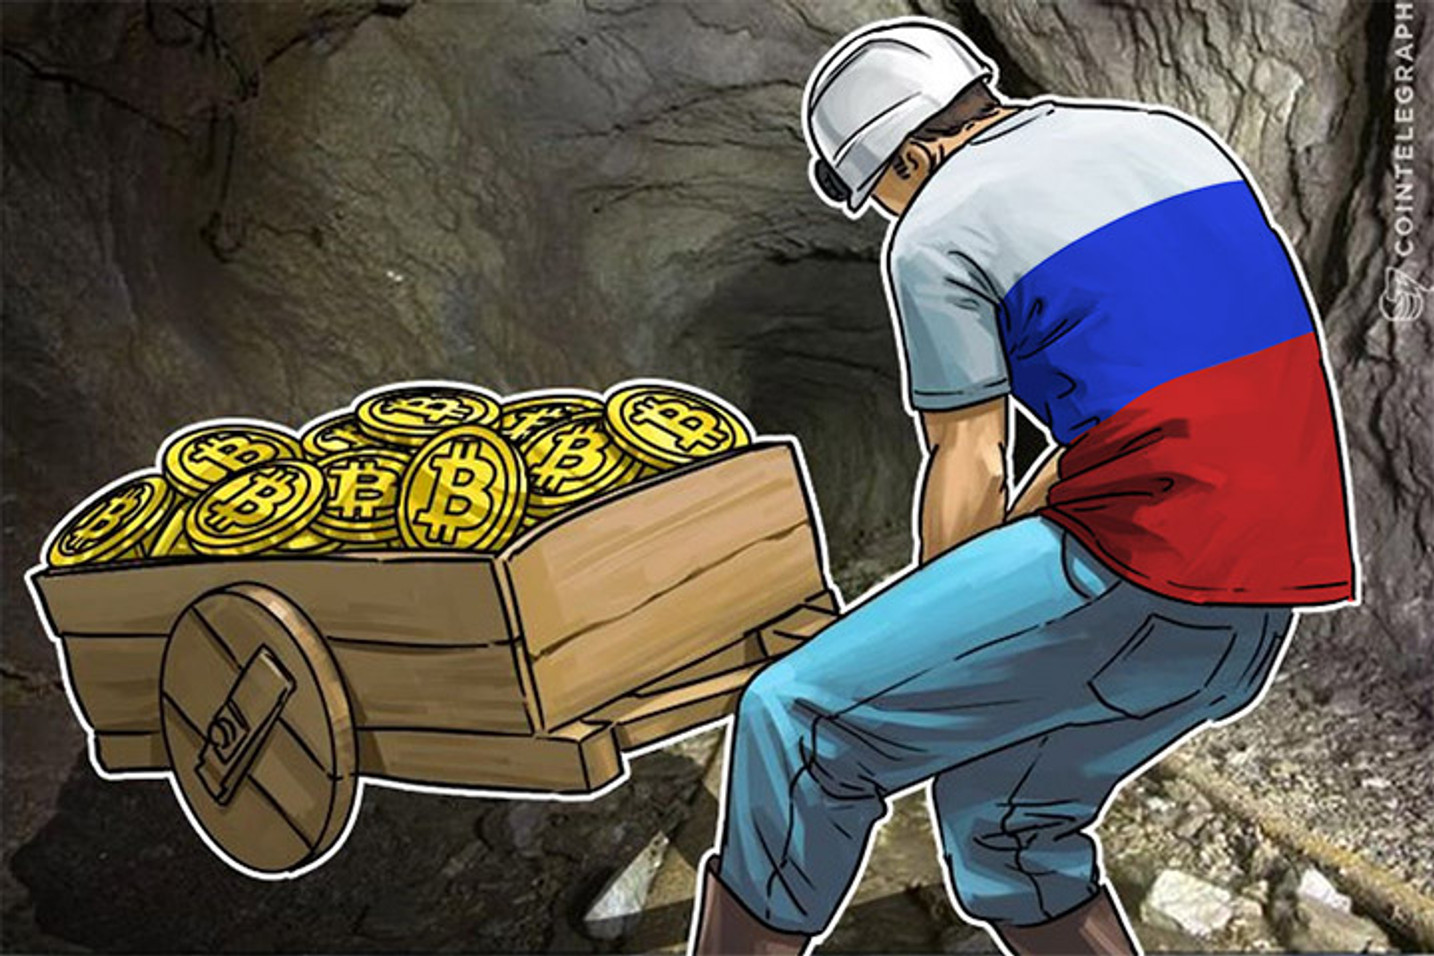 Gobierno ruso planea subsidiar costos eléctricos de minería Bitcoin